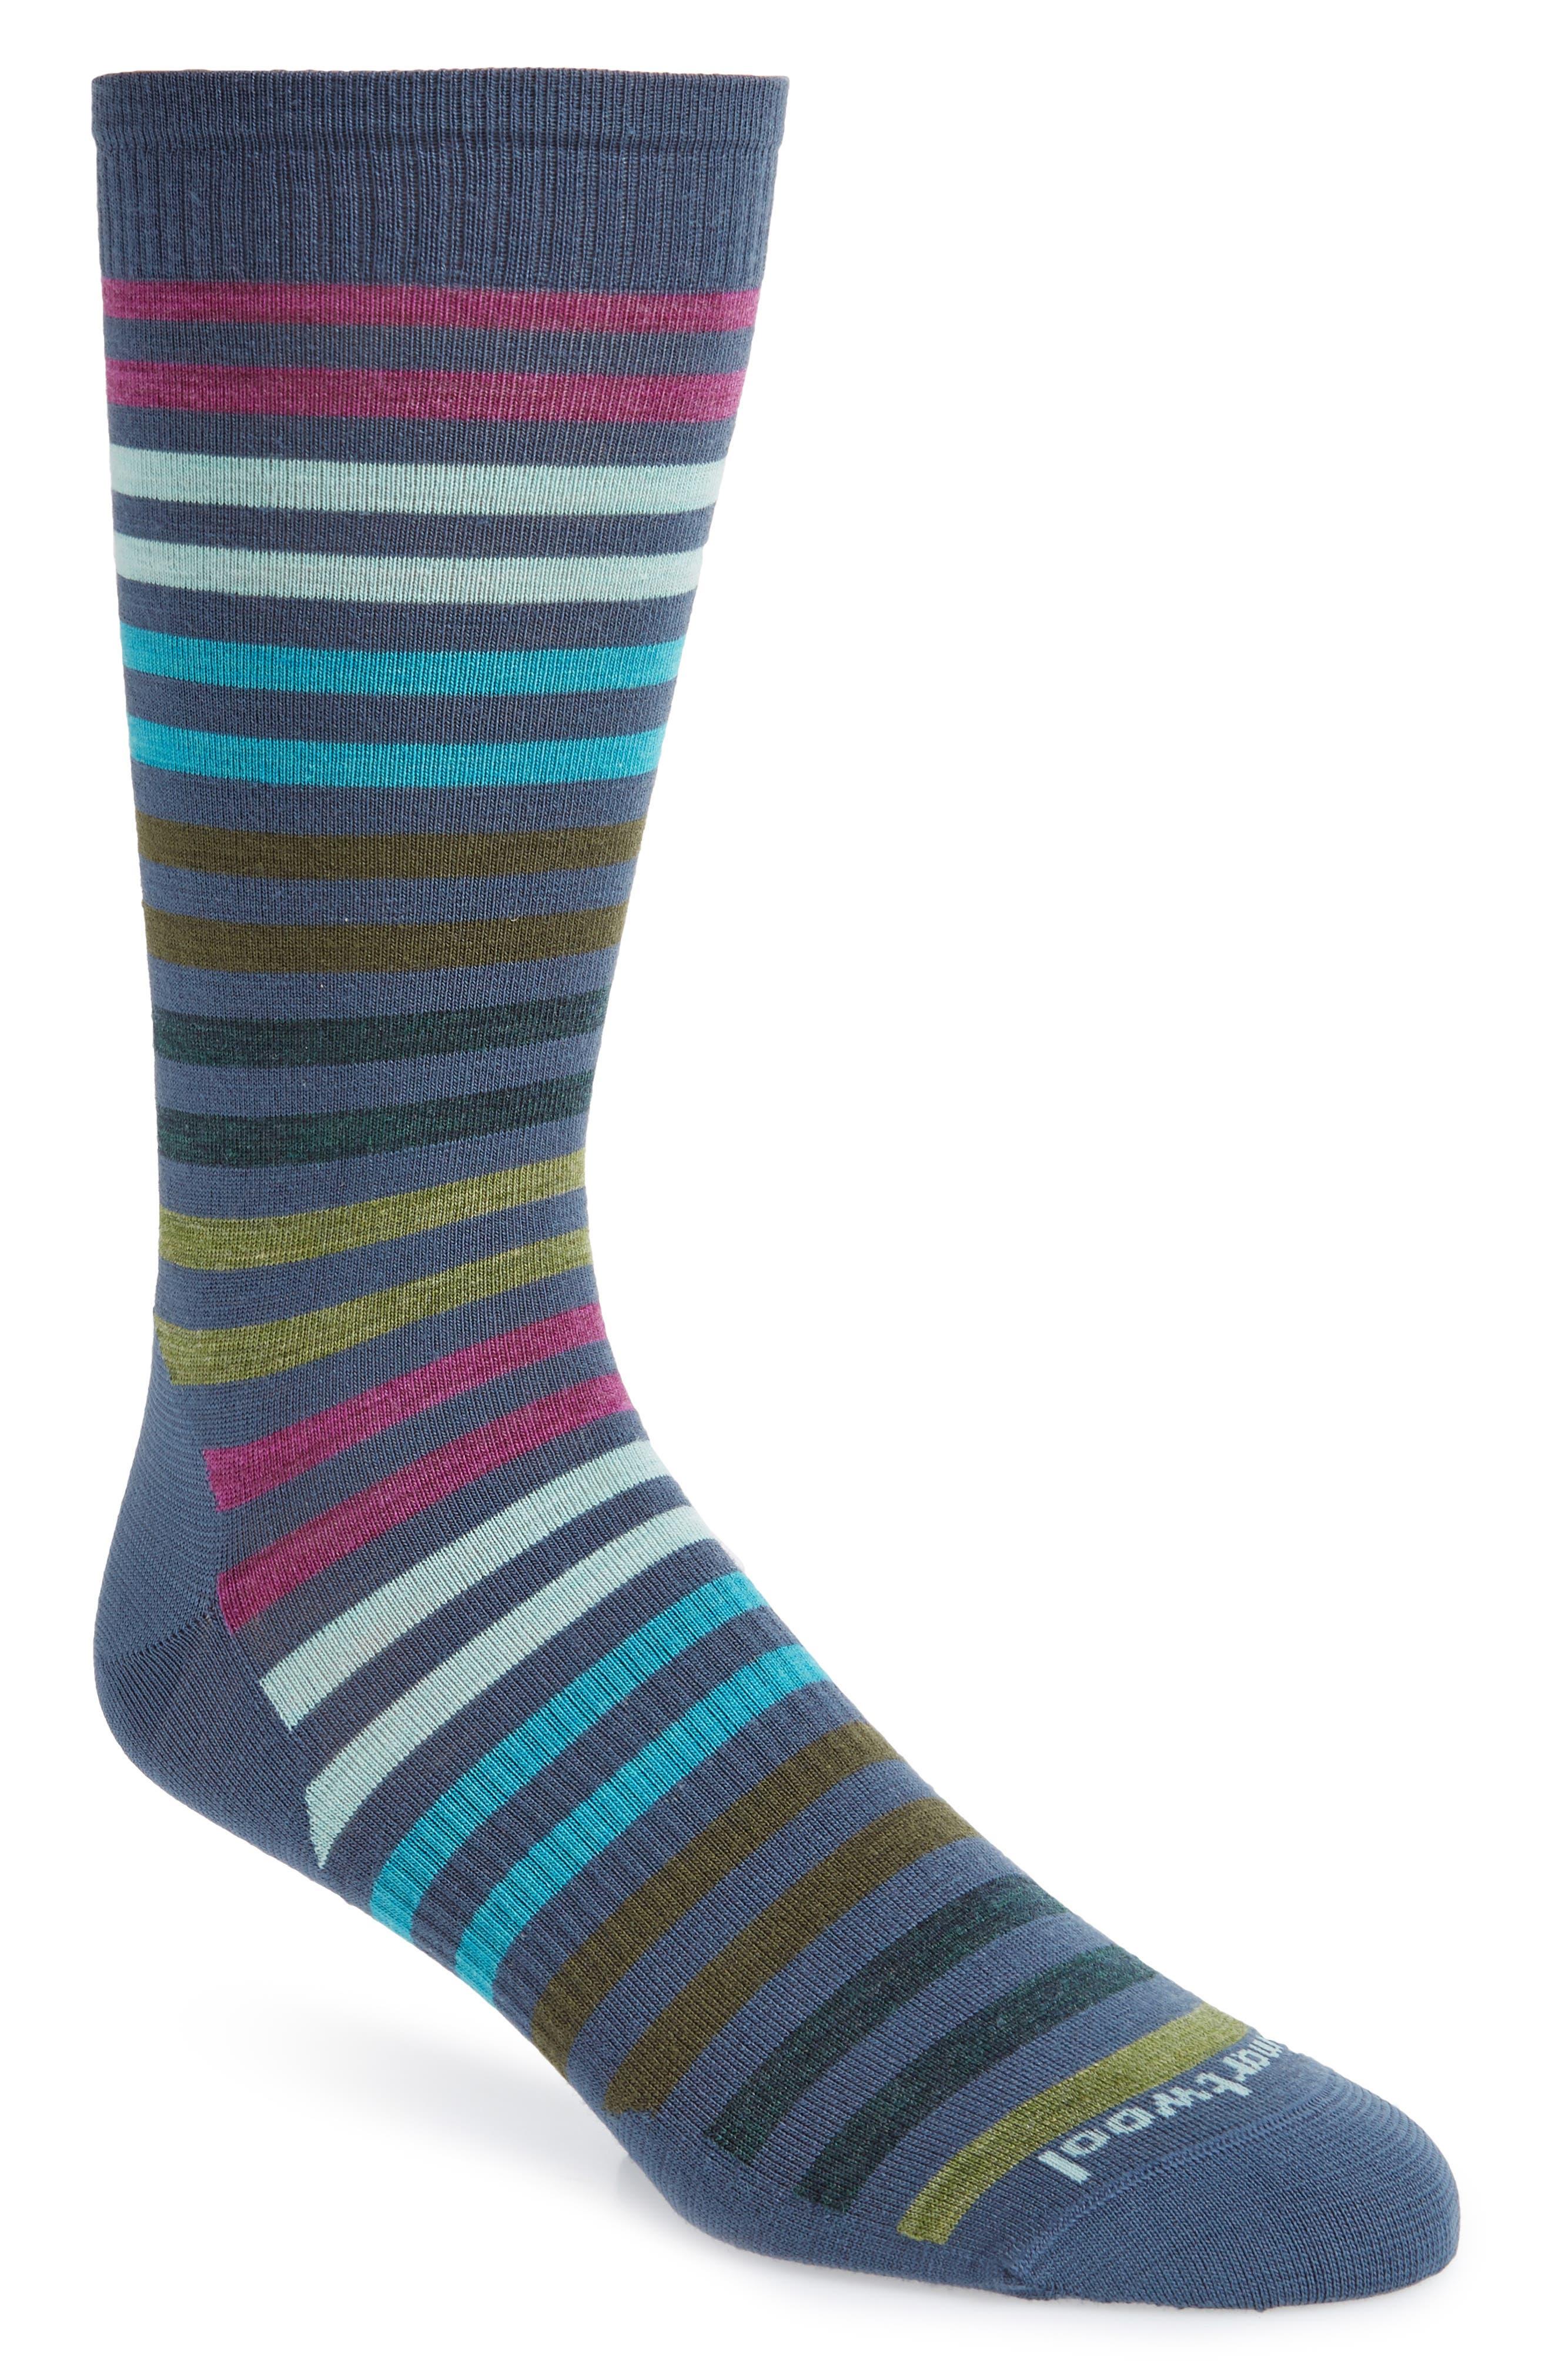 'Spruce Street' Stripe Merino Wool Blend Socks,                             Main thumbnail 1, color,                             DARK BLUE STEEL HEATHER